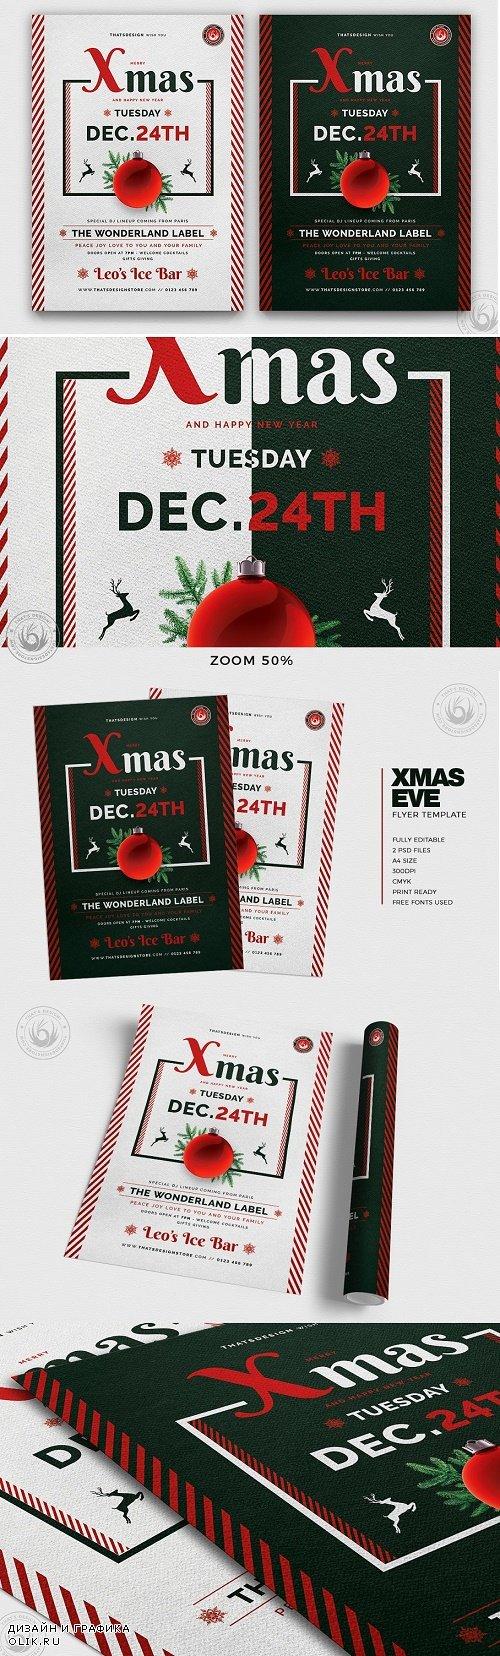 Christmas Eve Flyer Template V12 - 4272738